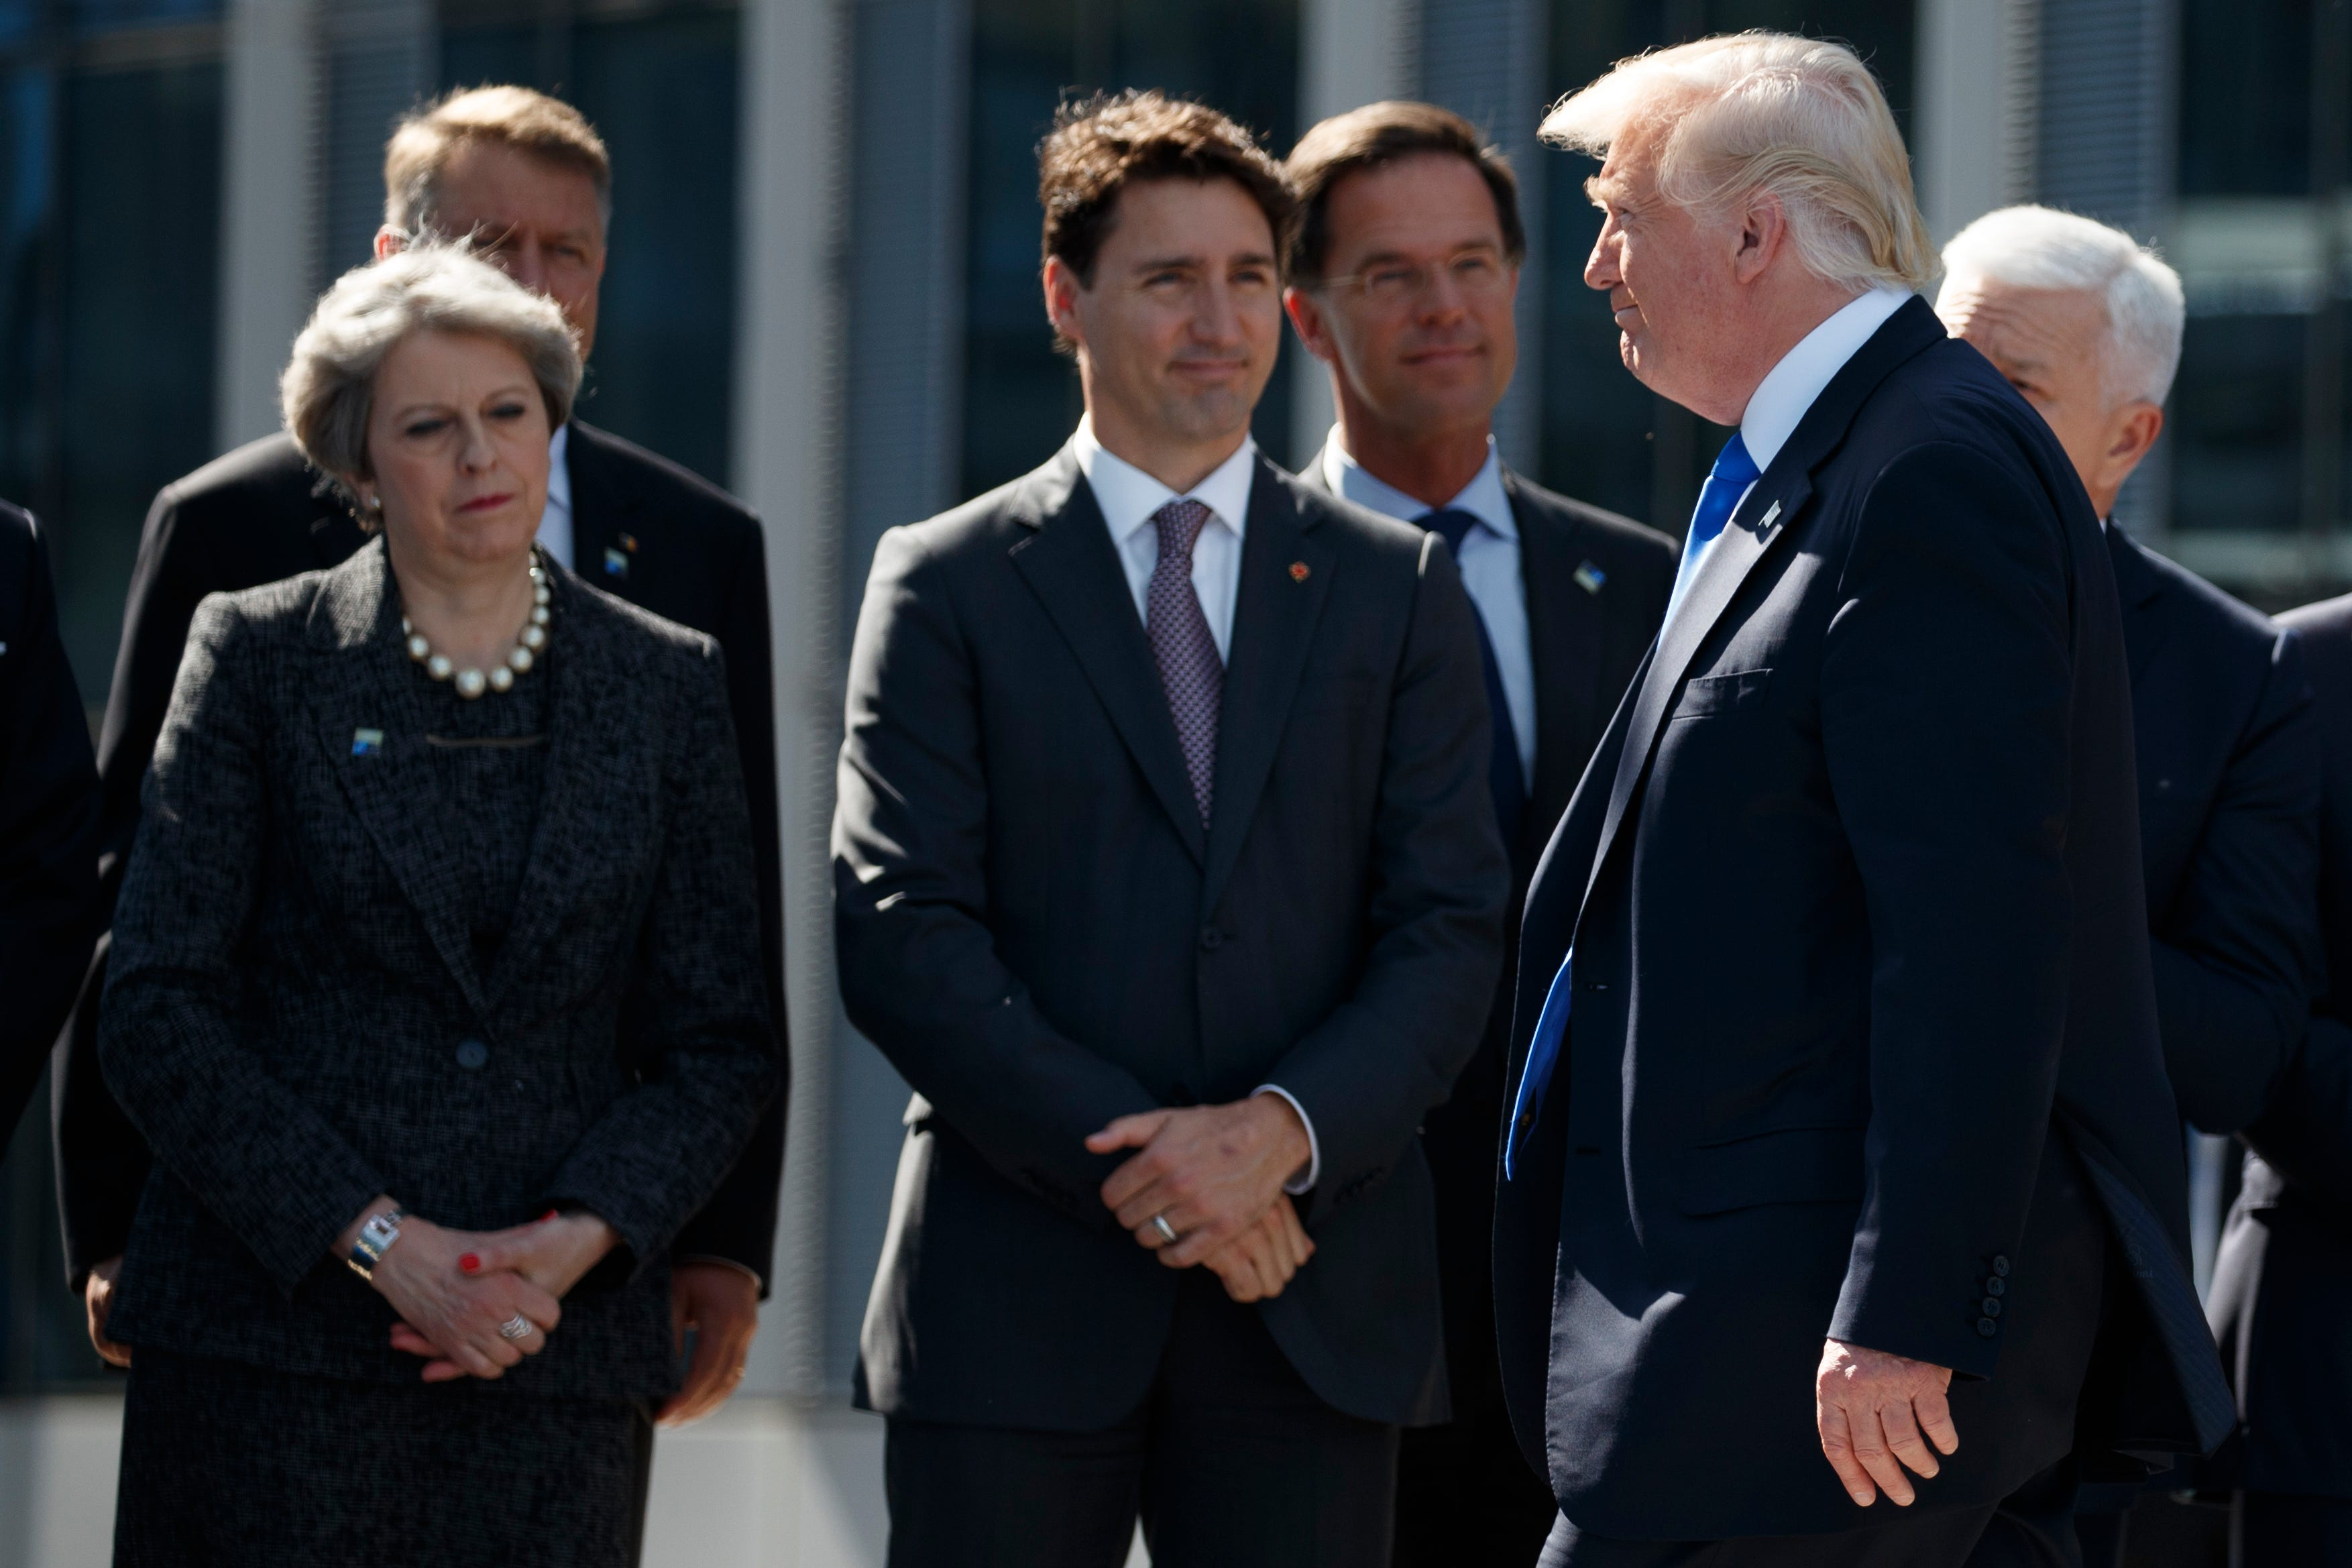 President Trump shoved the Montenegro prime minister at NATO